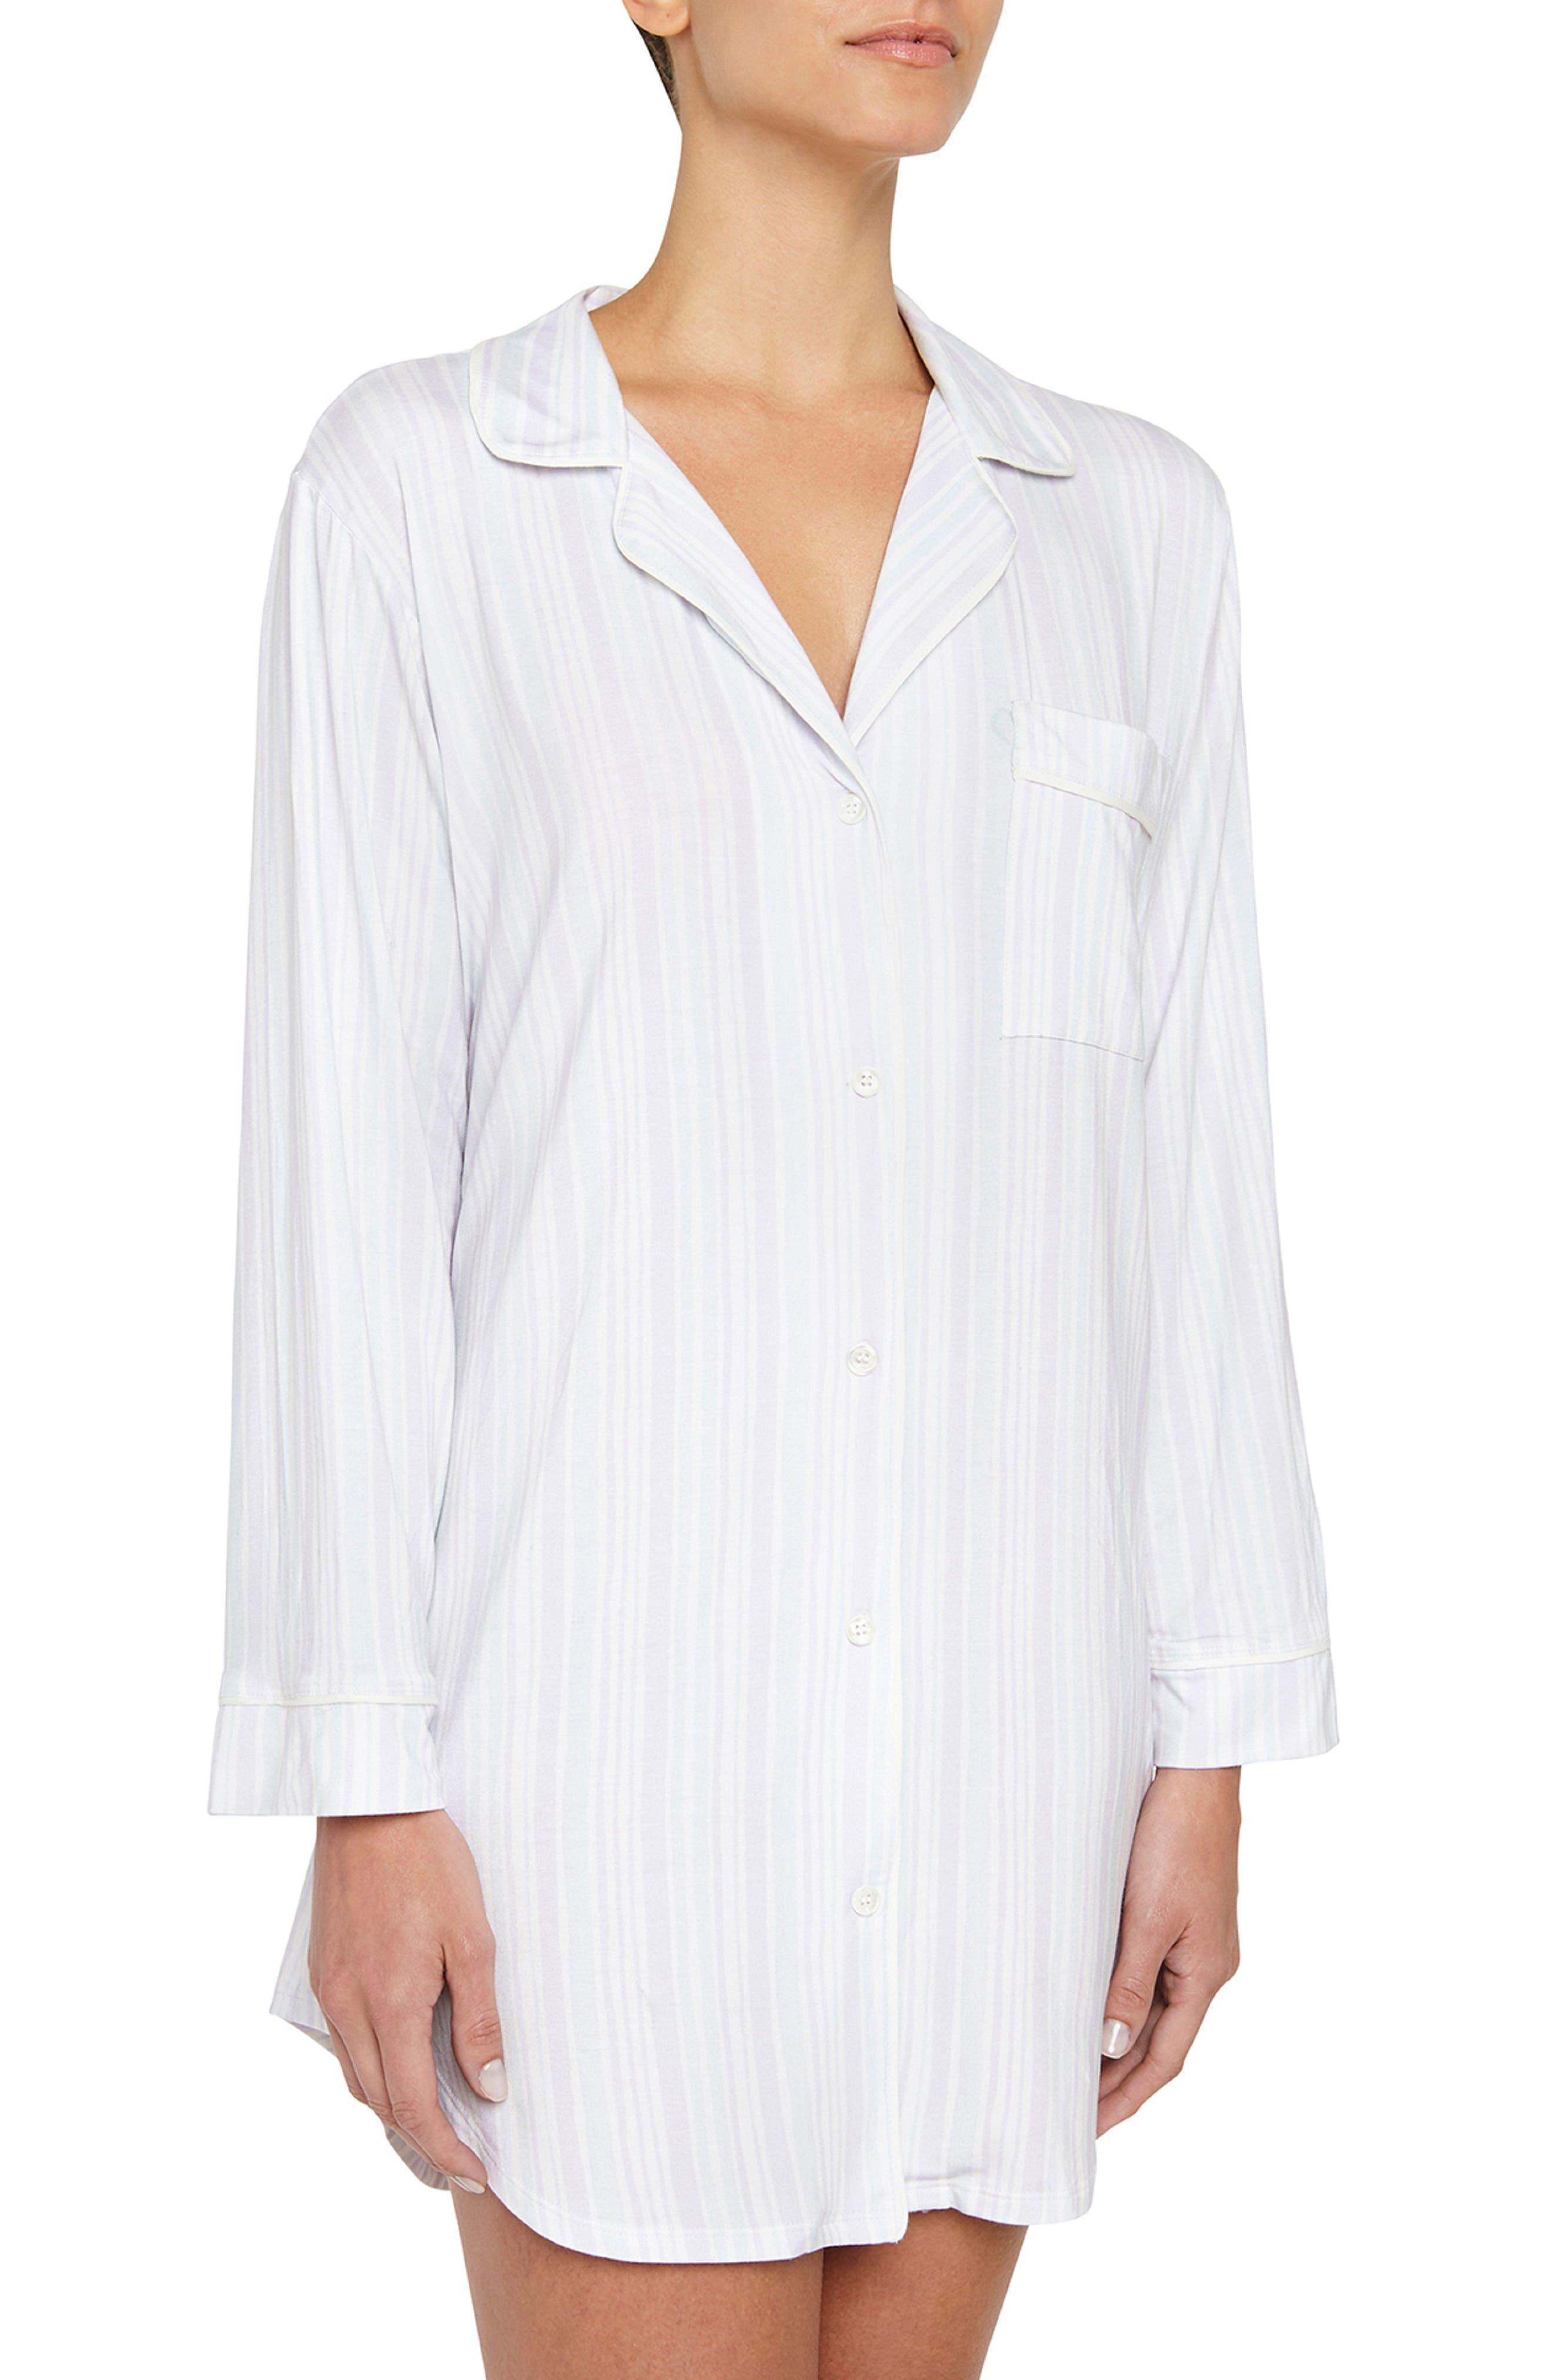 Painted Stripes Sleep Shirt,                             Main thumbnail 1, color,                             500